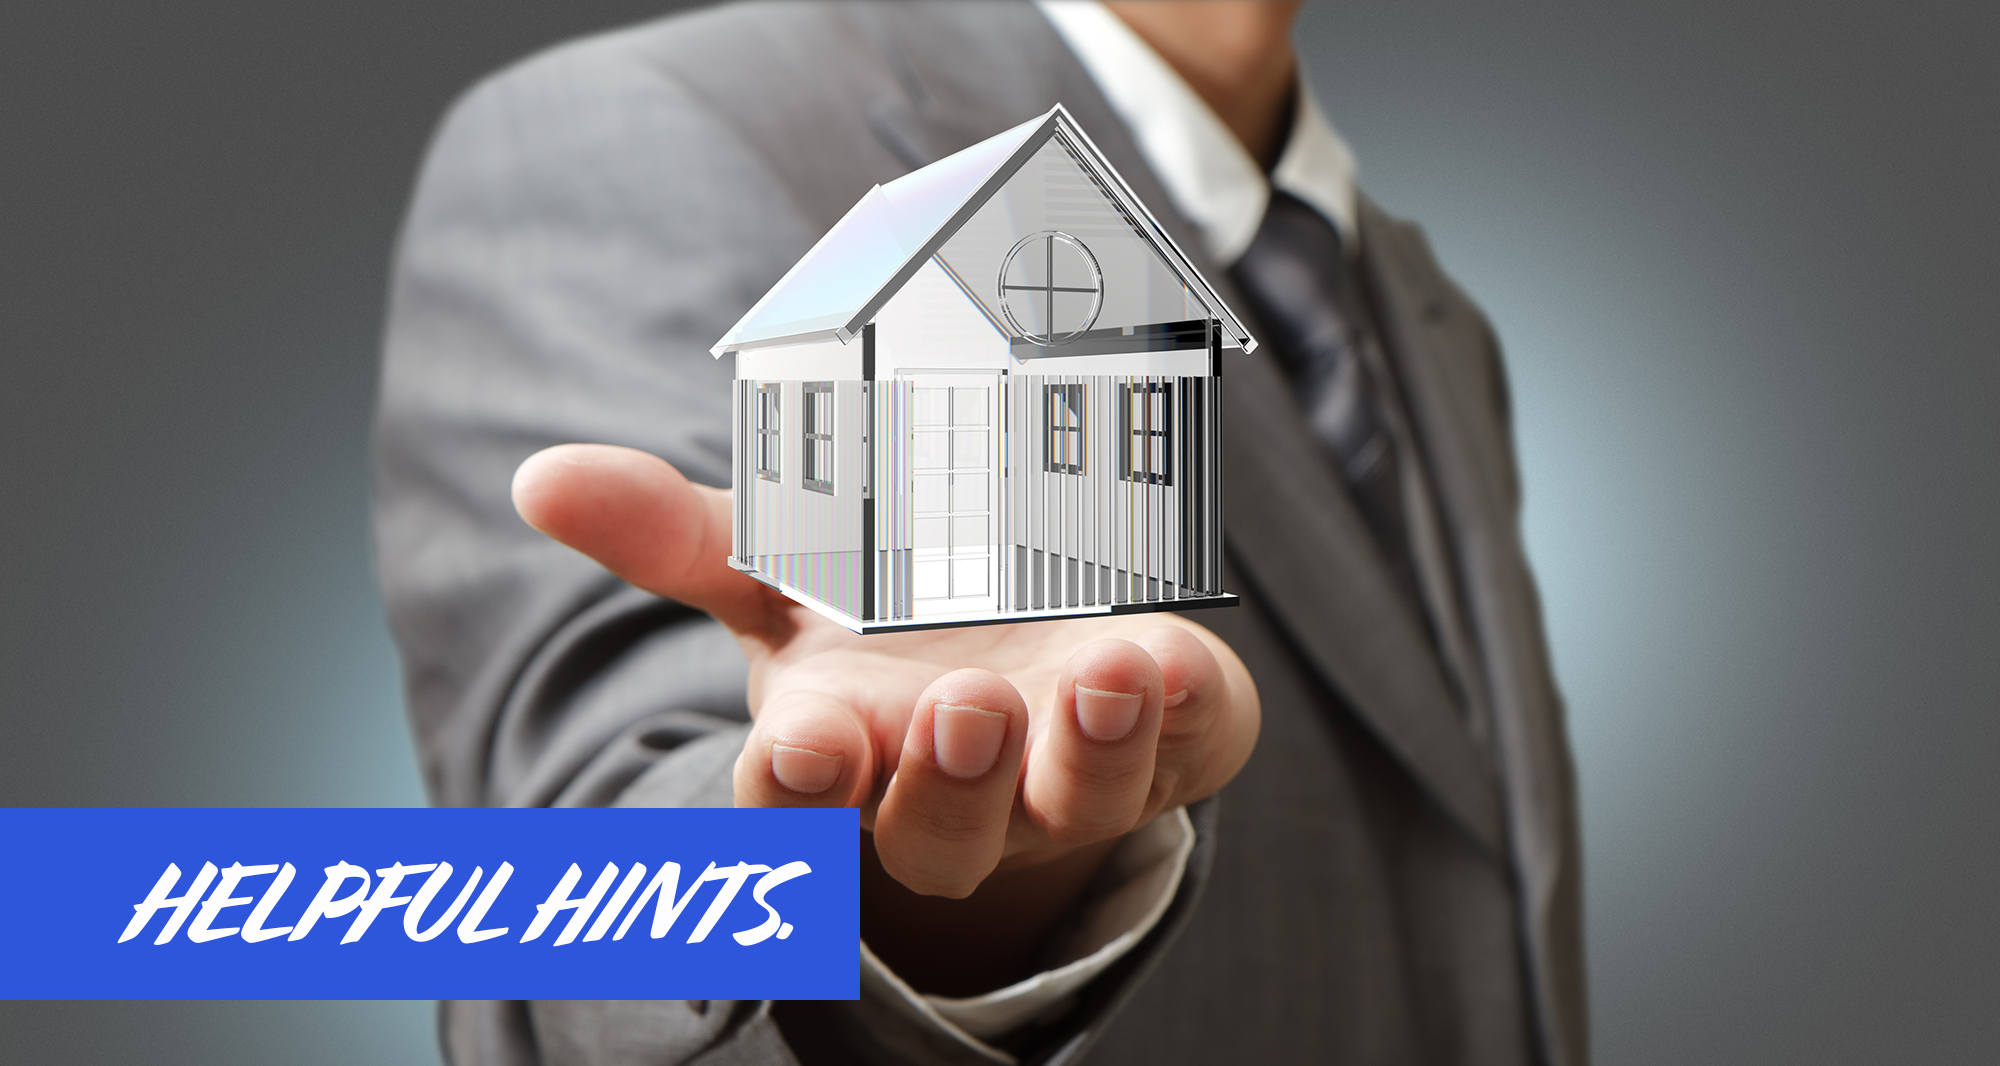 MIKROTEC SECURITY HELPFUL HINT